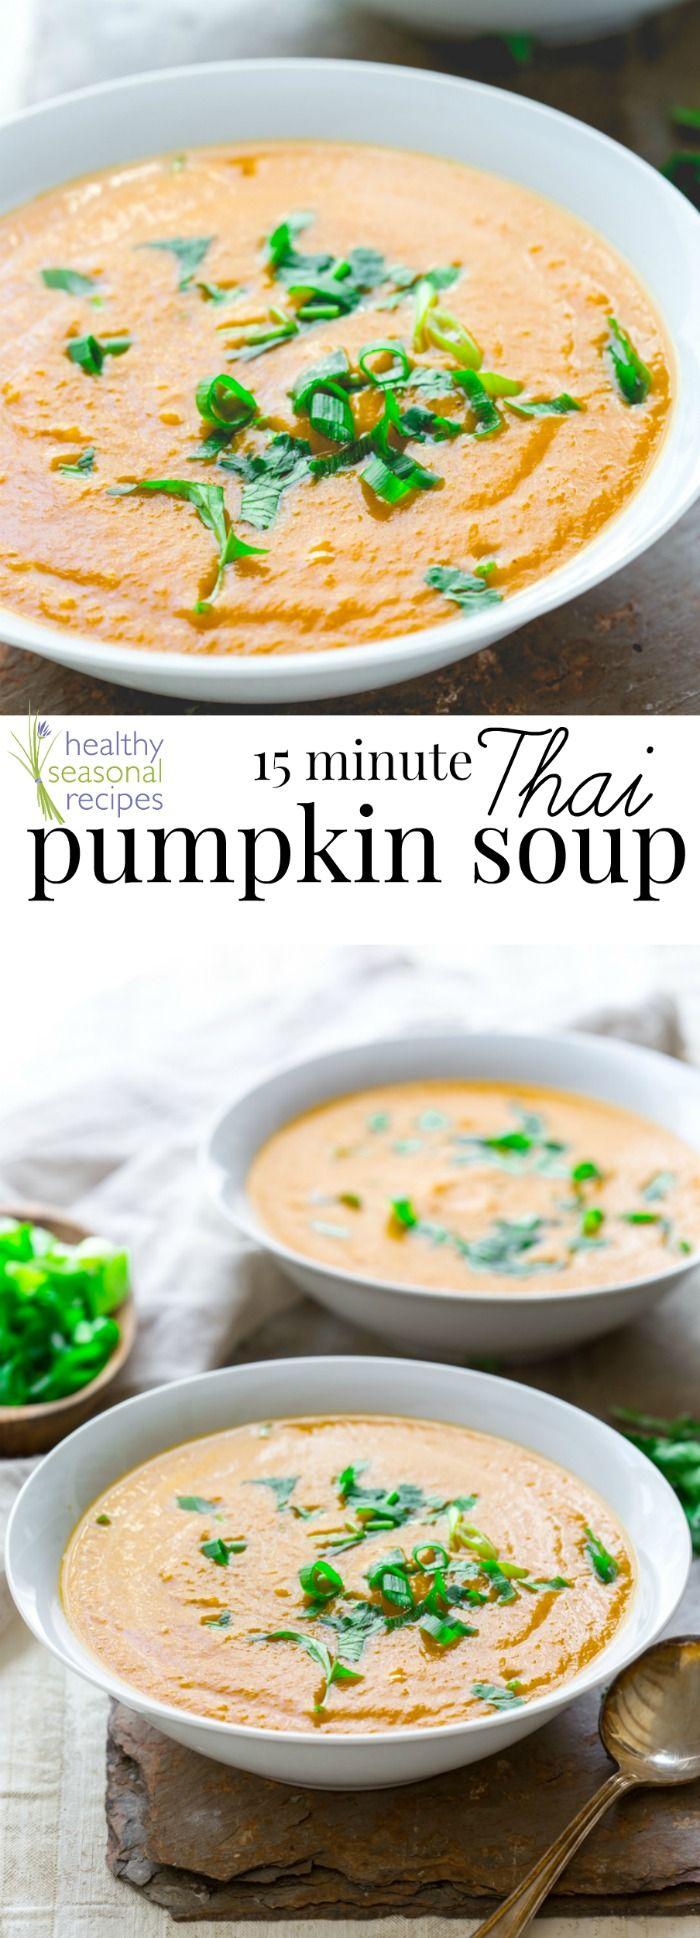 15 minute thai pumpkin soup - Healthy Seasonal Recipes (Gluten Free Recipes Pumpkin)